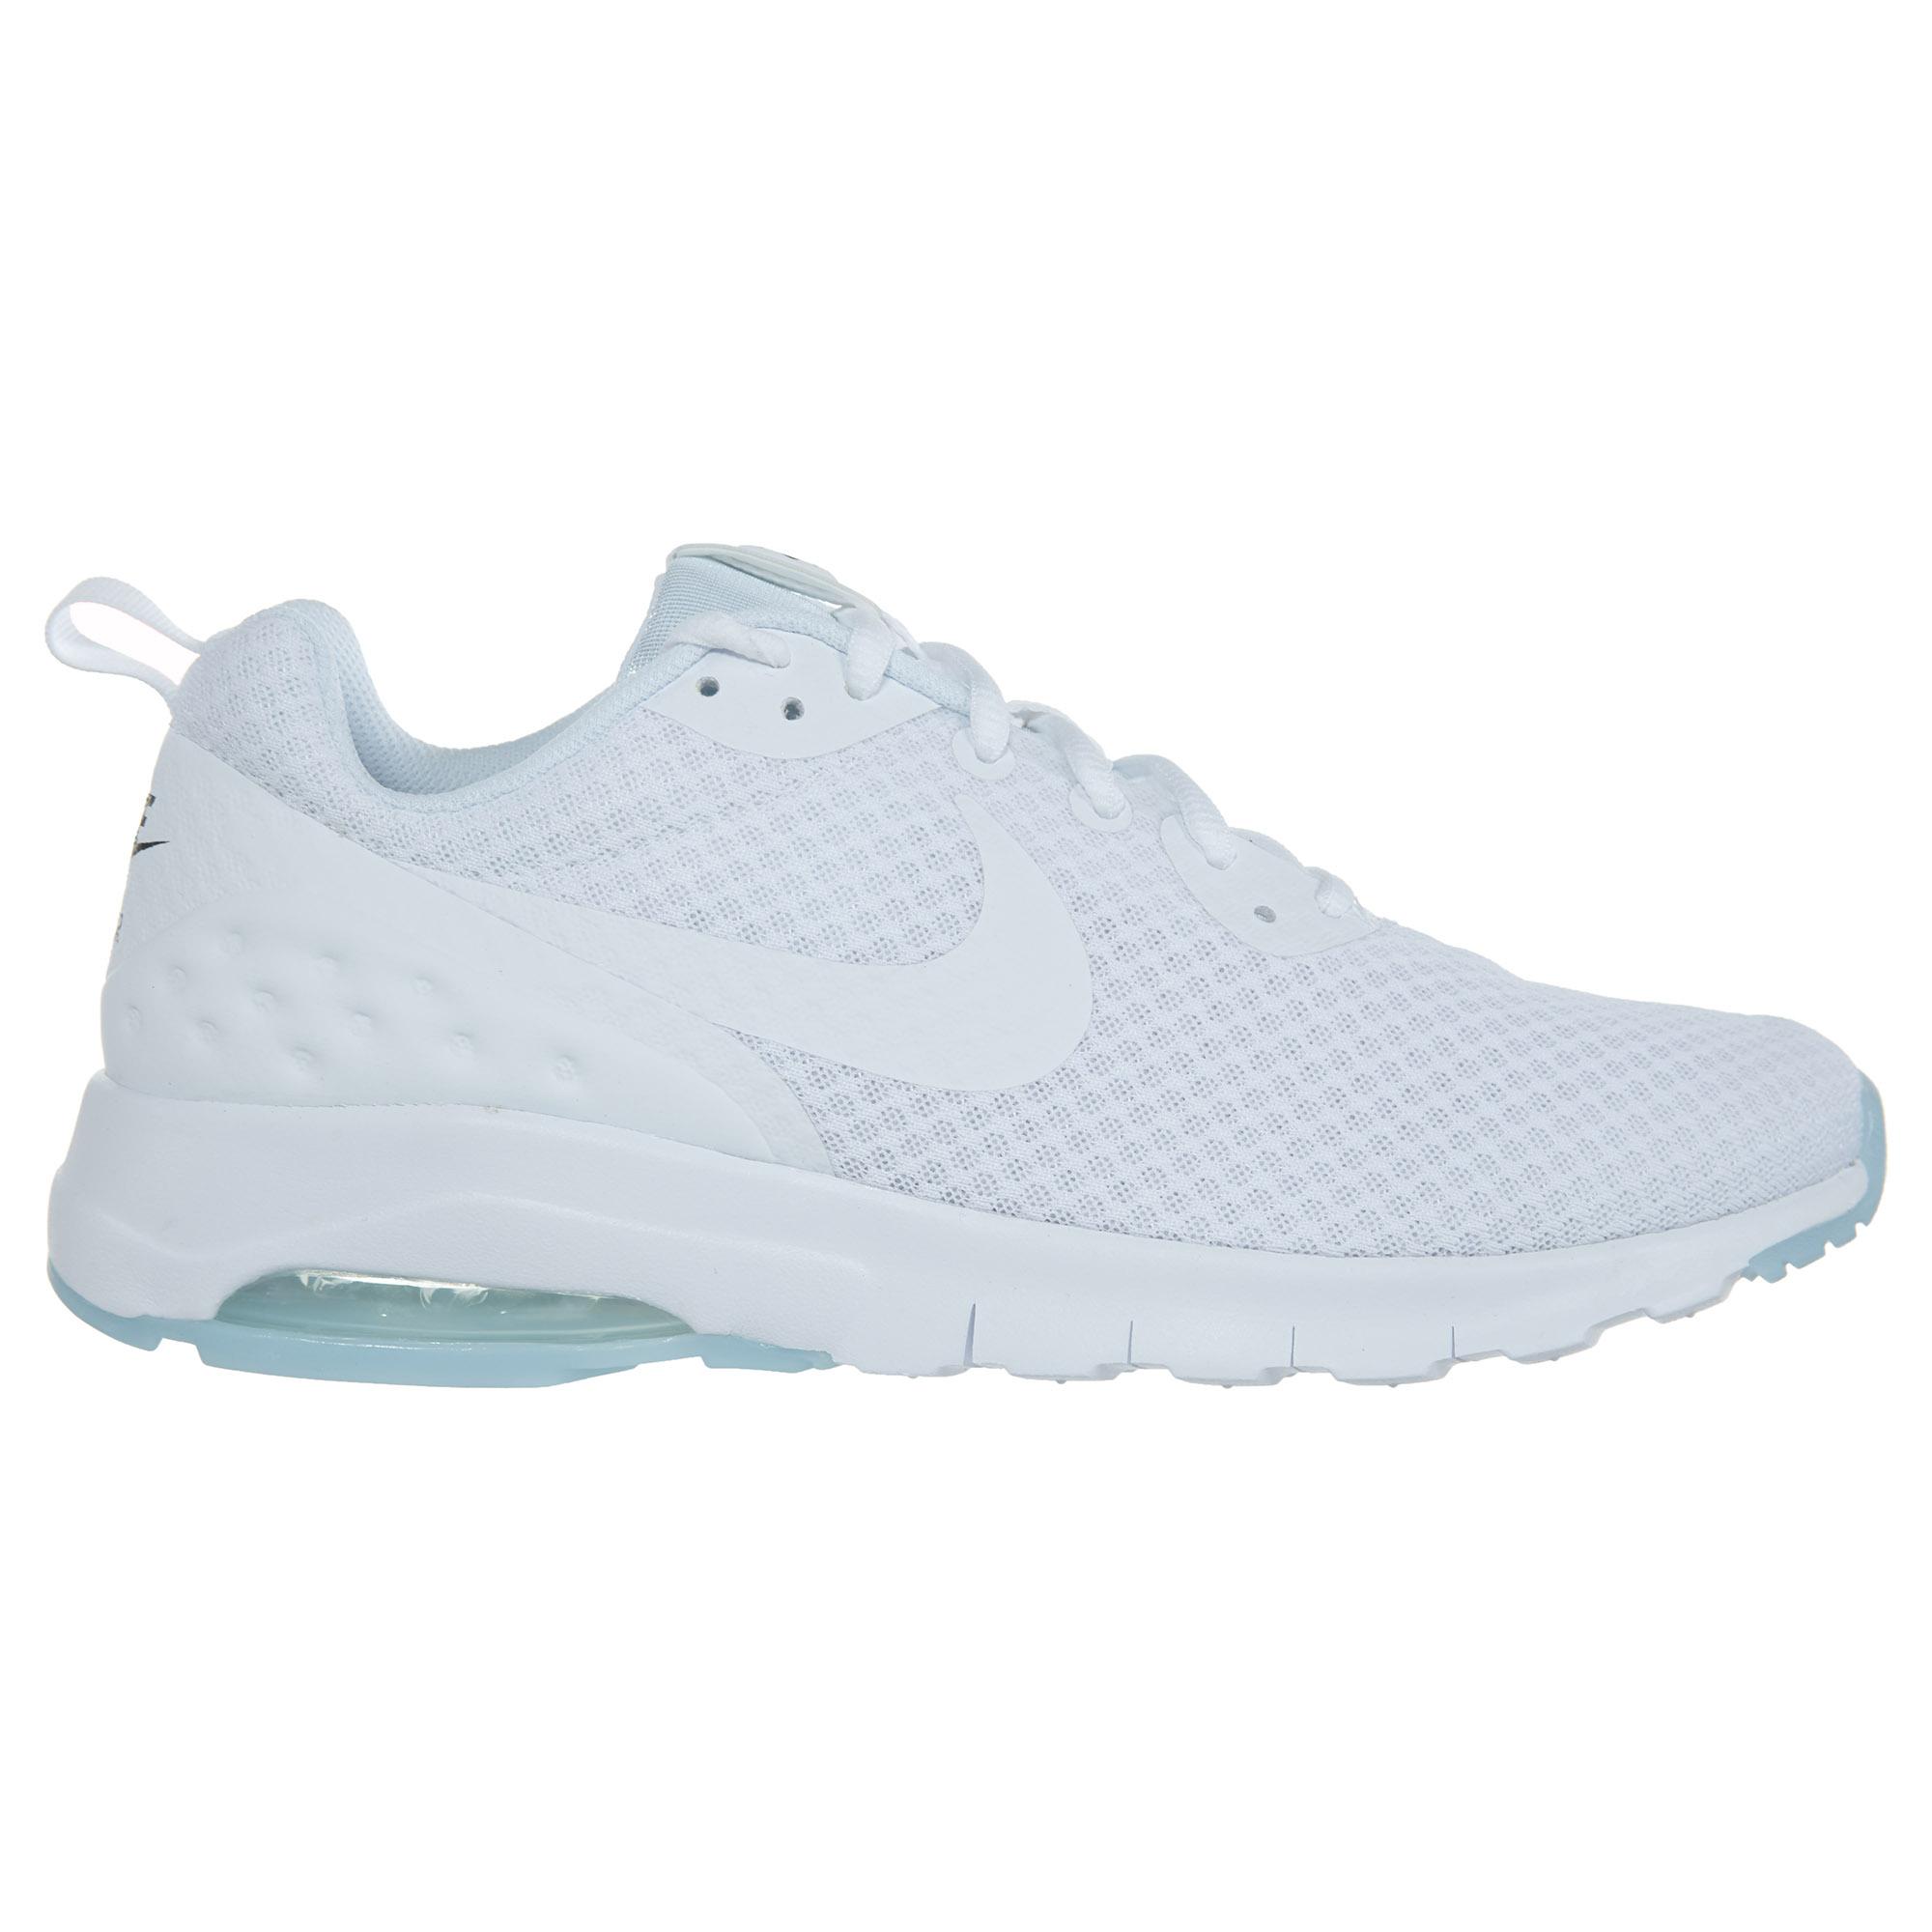 Nike Air Max Motion Lw White White-Black - 833260-110